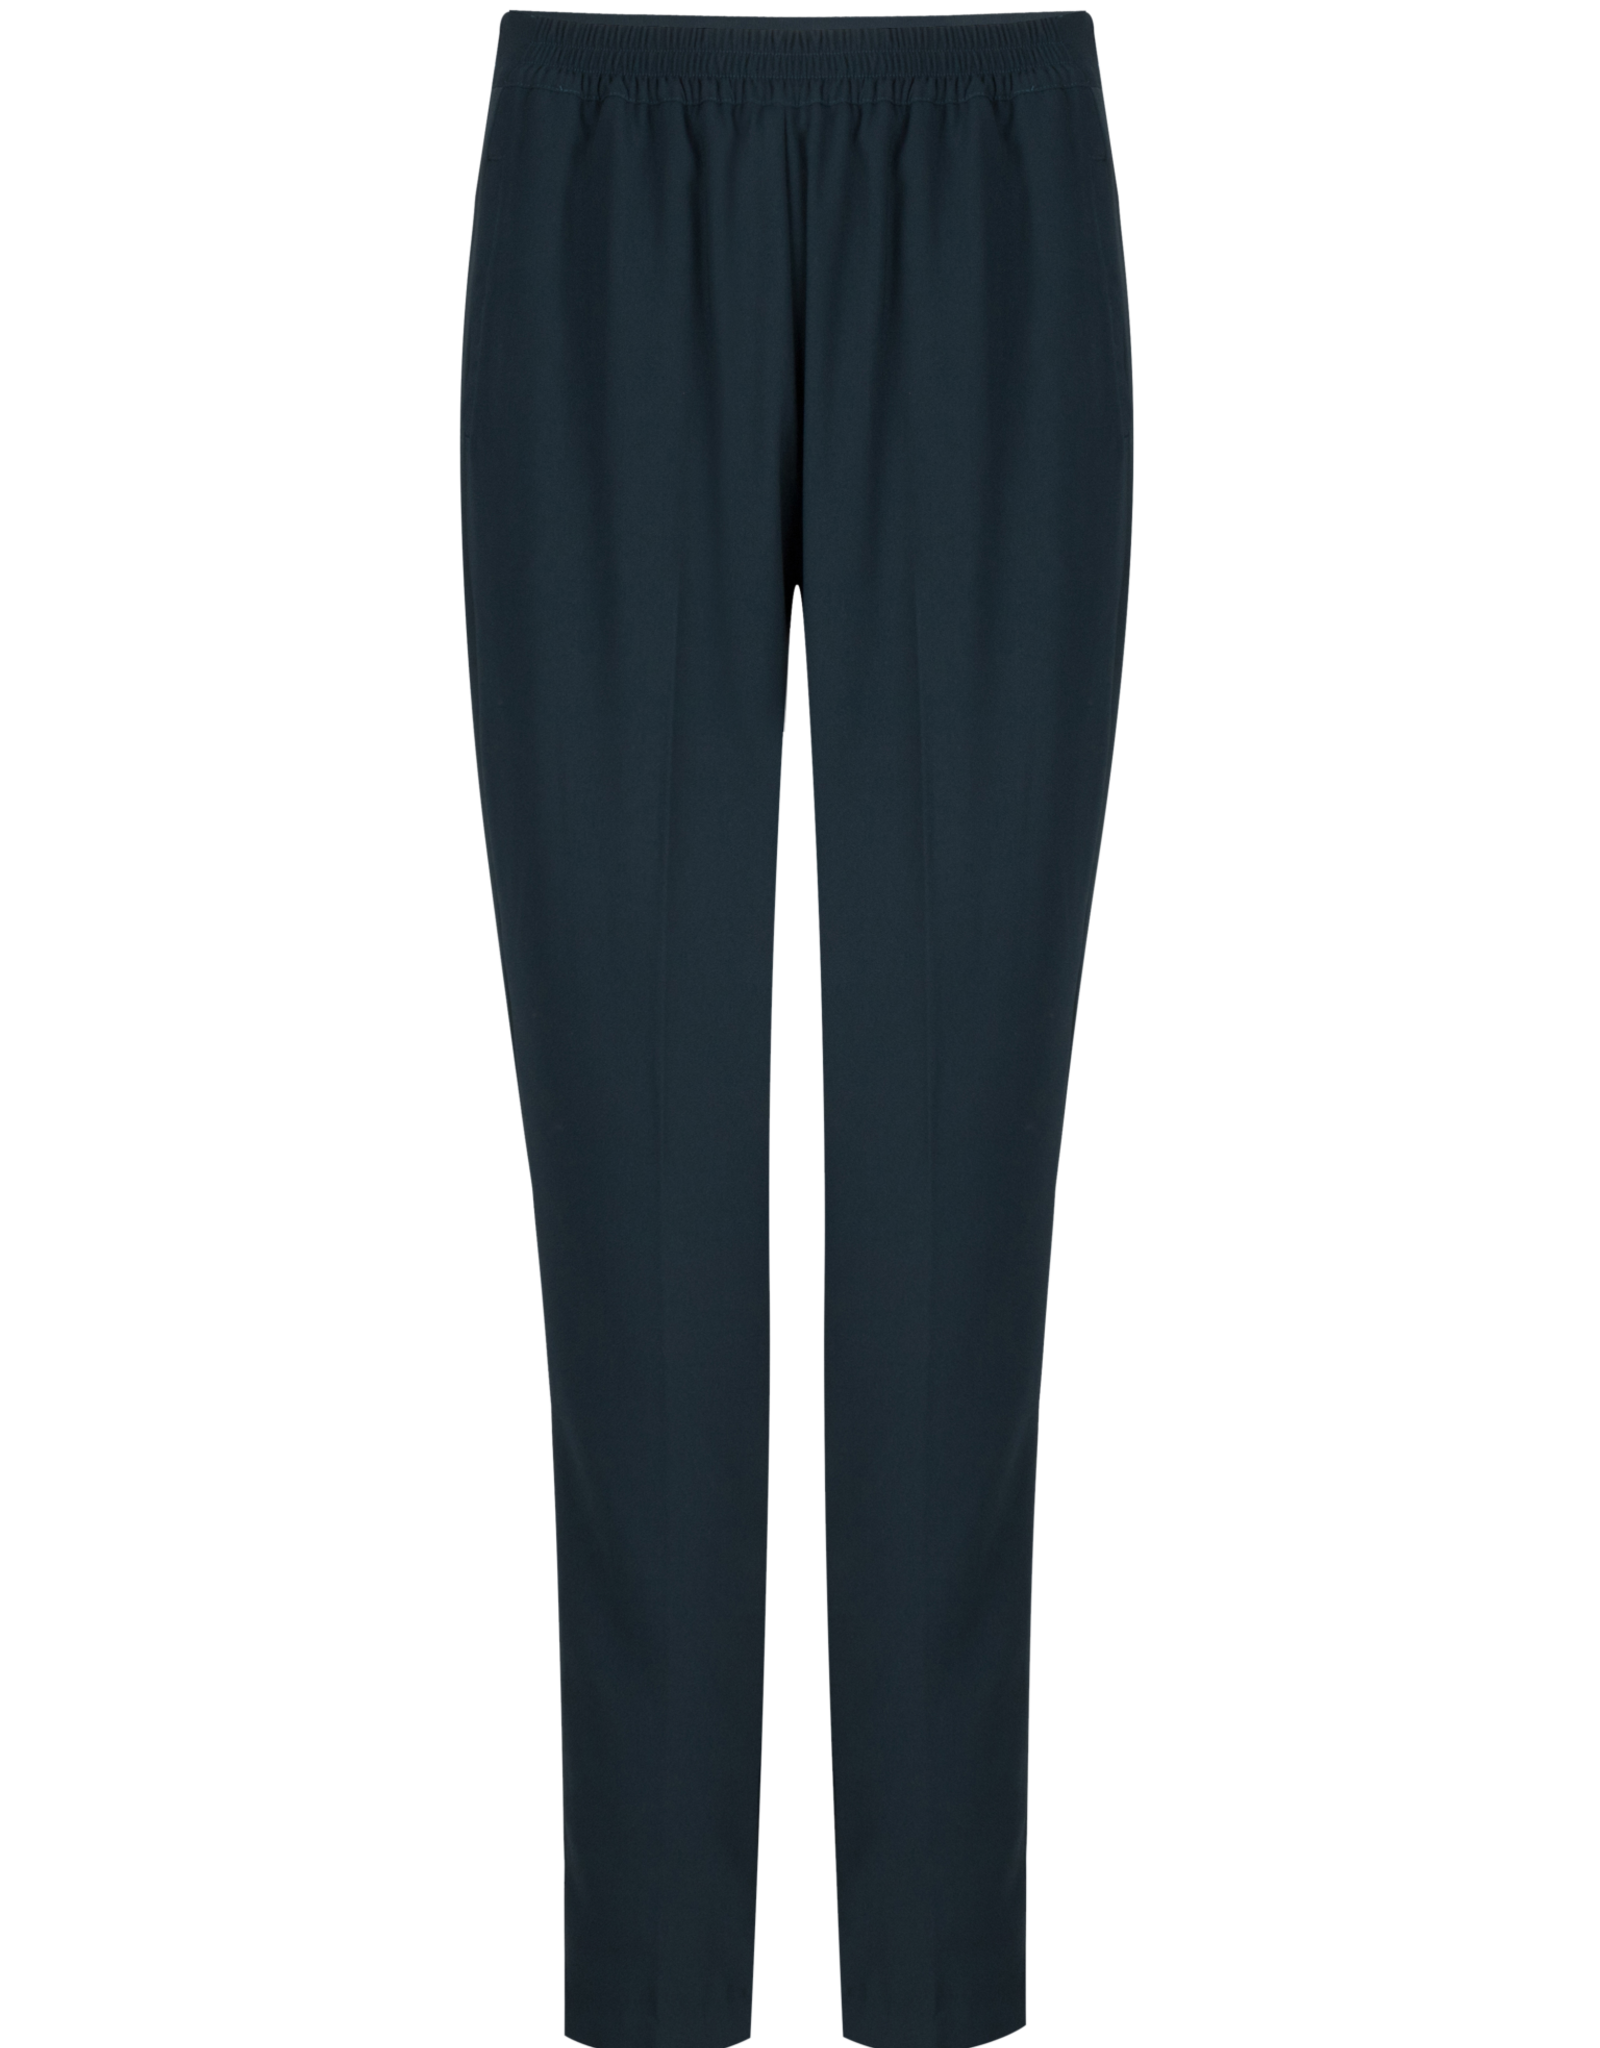 Dante6 Bowie satin detail pants Blue Lagoon